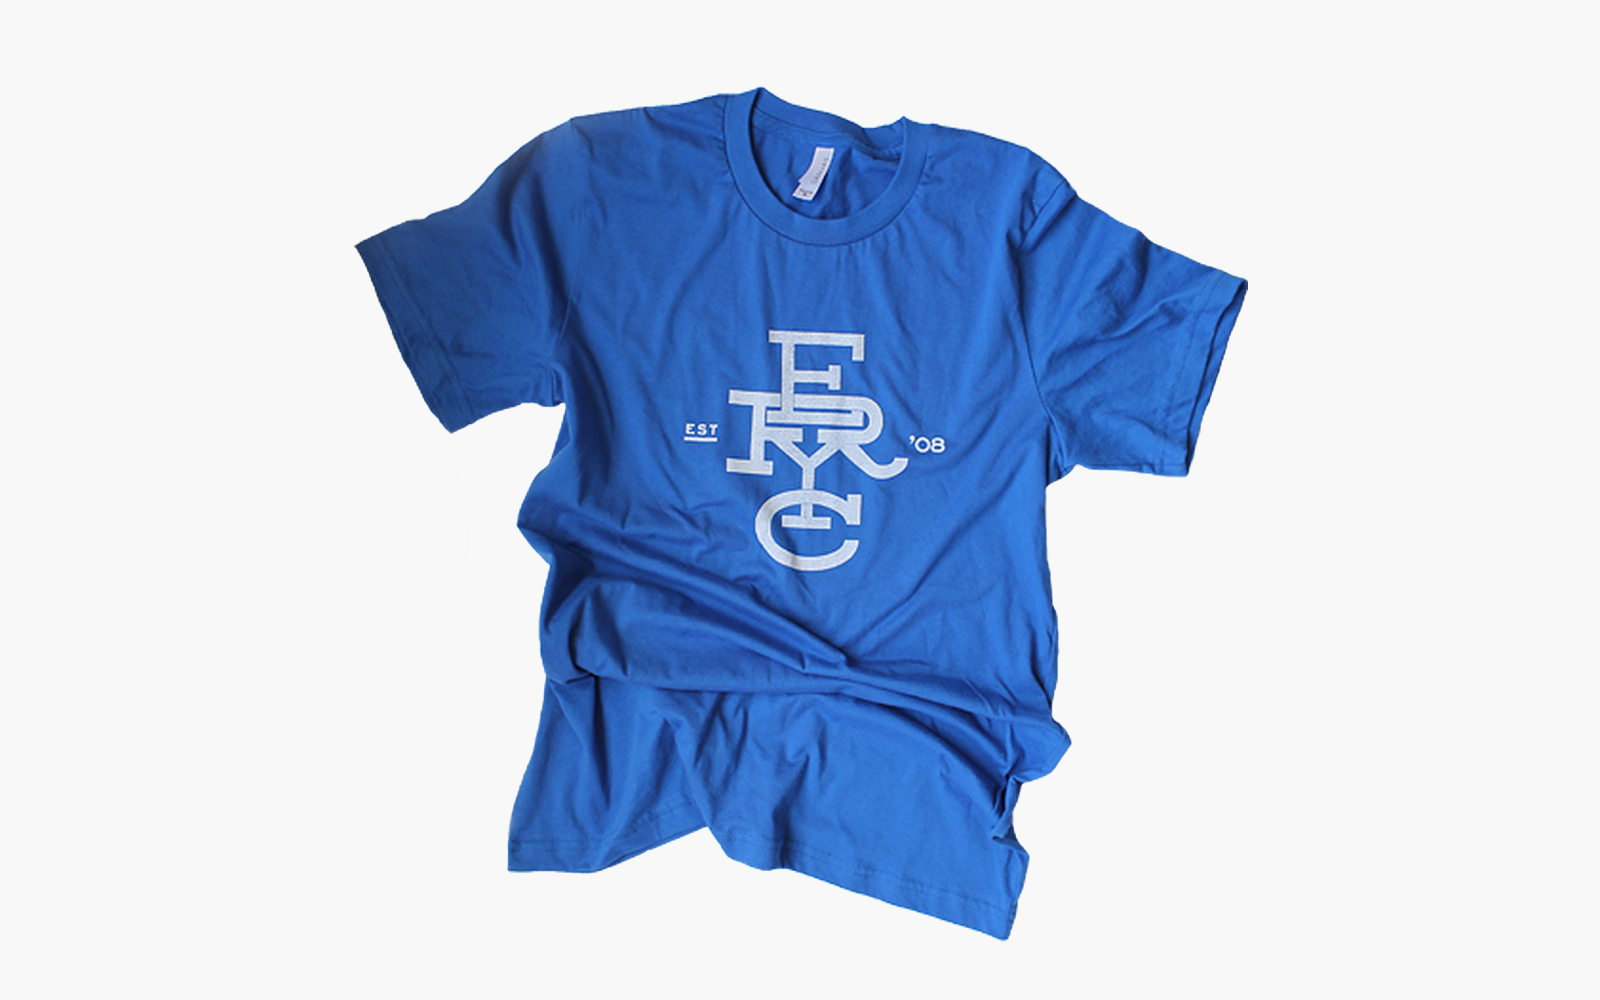 Monogram_Shirt